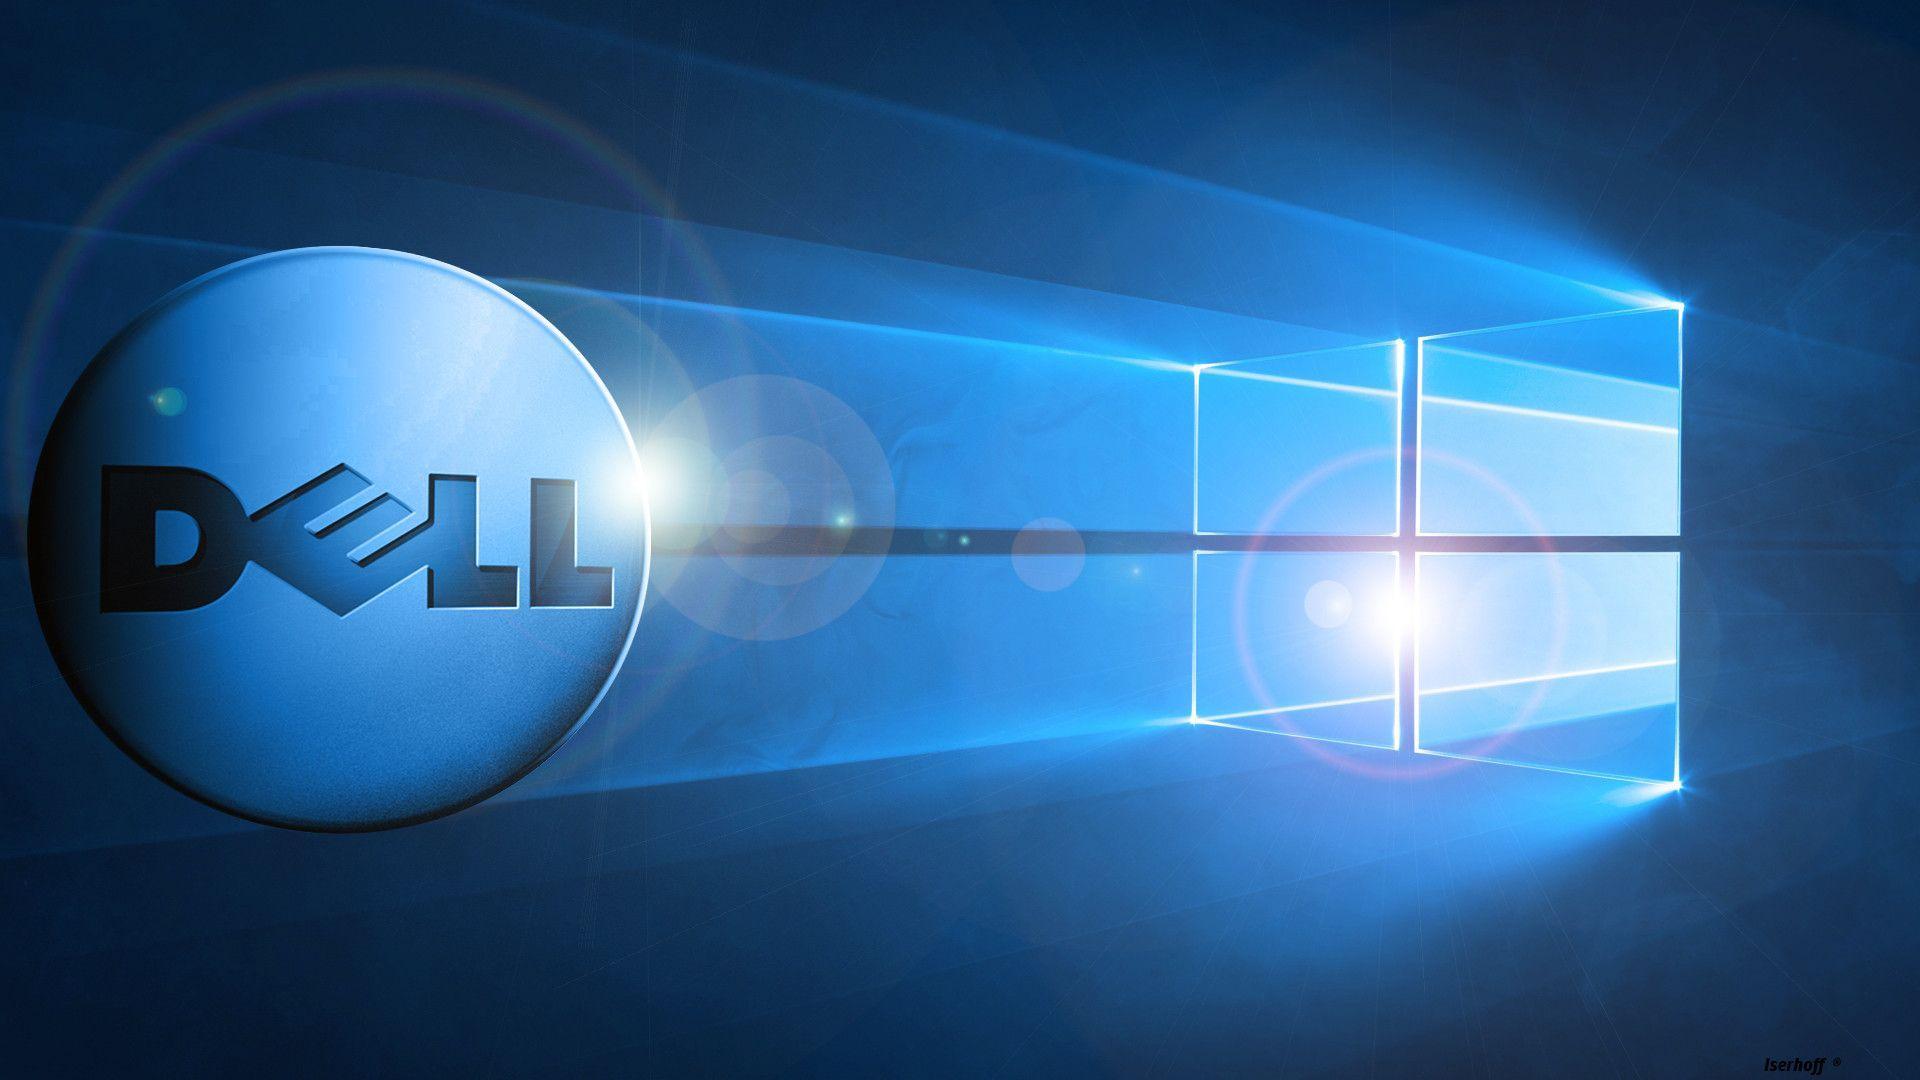 Windows 10 Wallpaper Dell